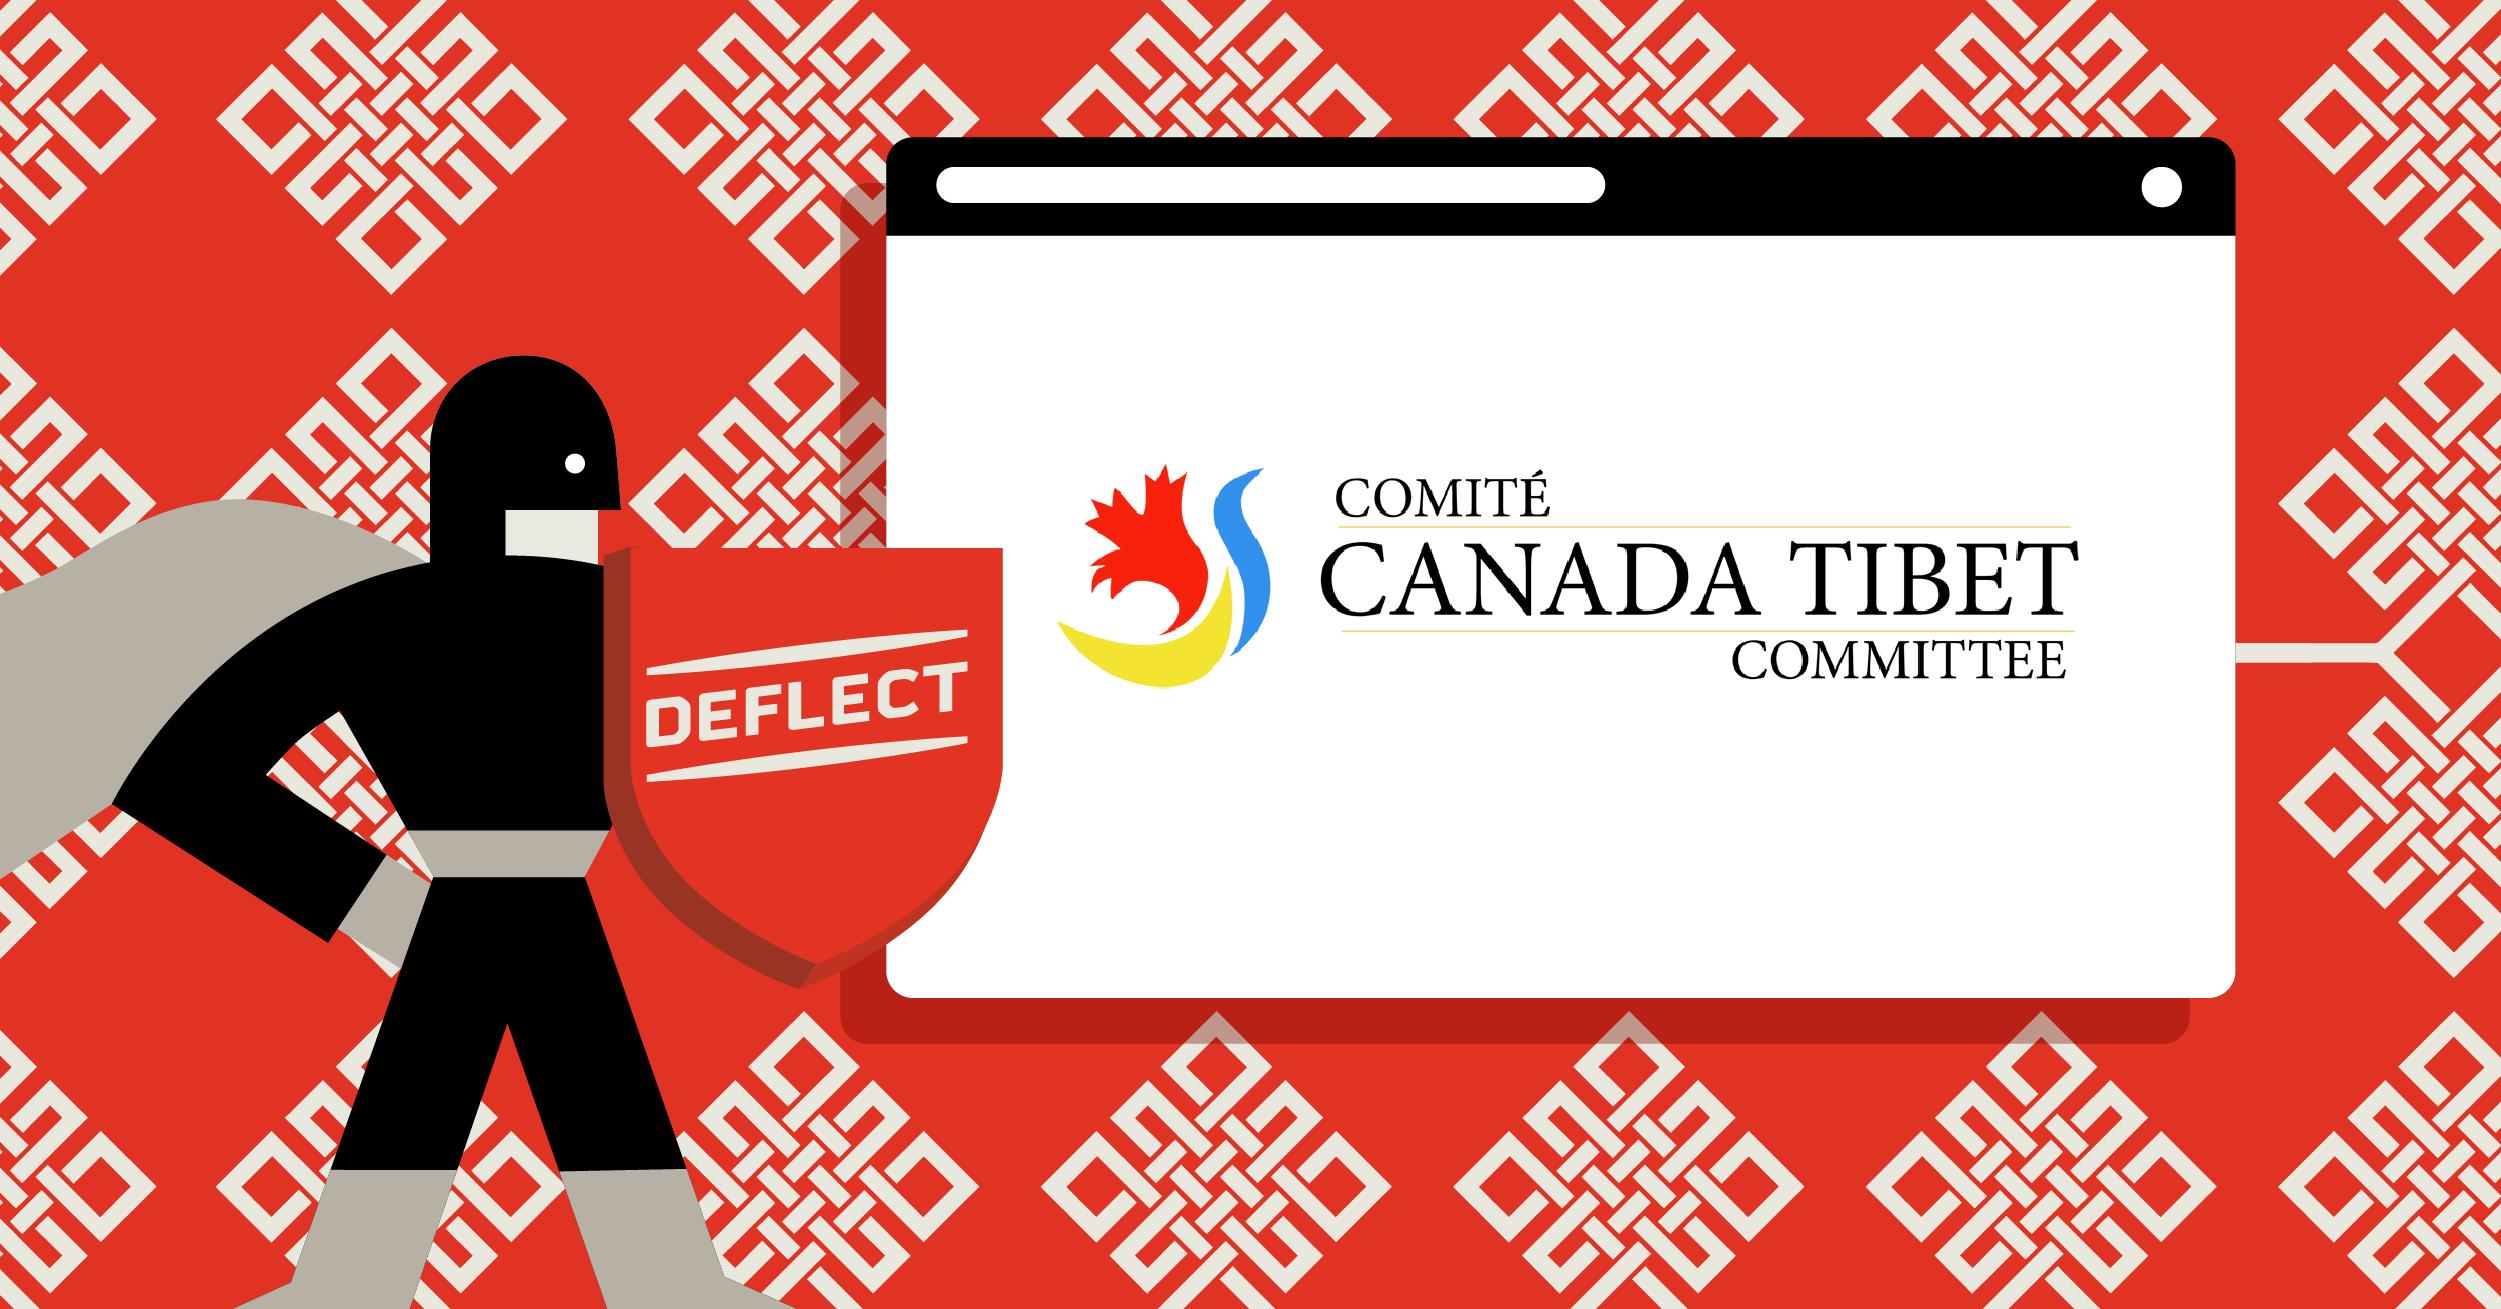 The Canada Tibet Committee